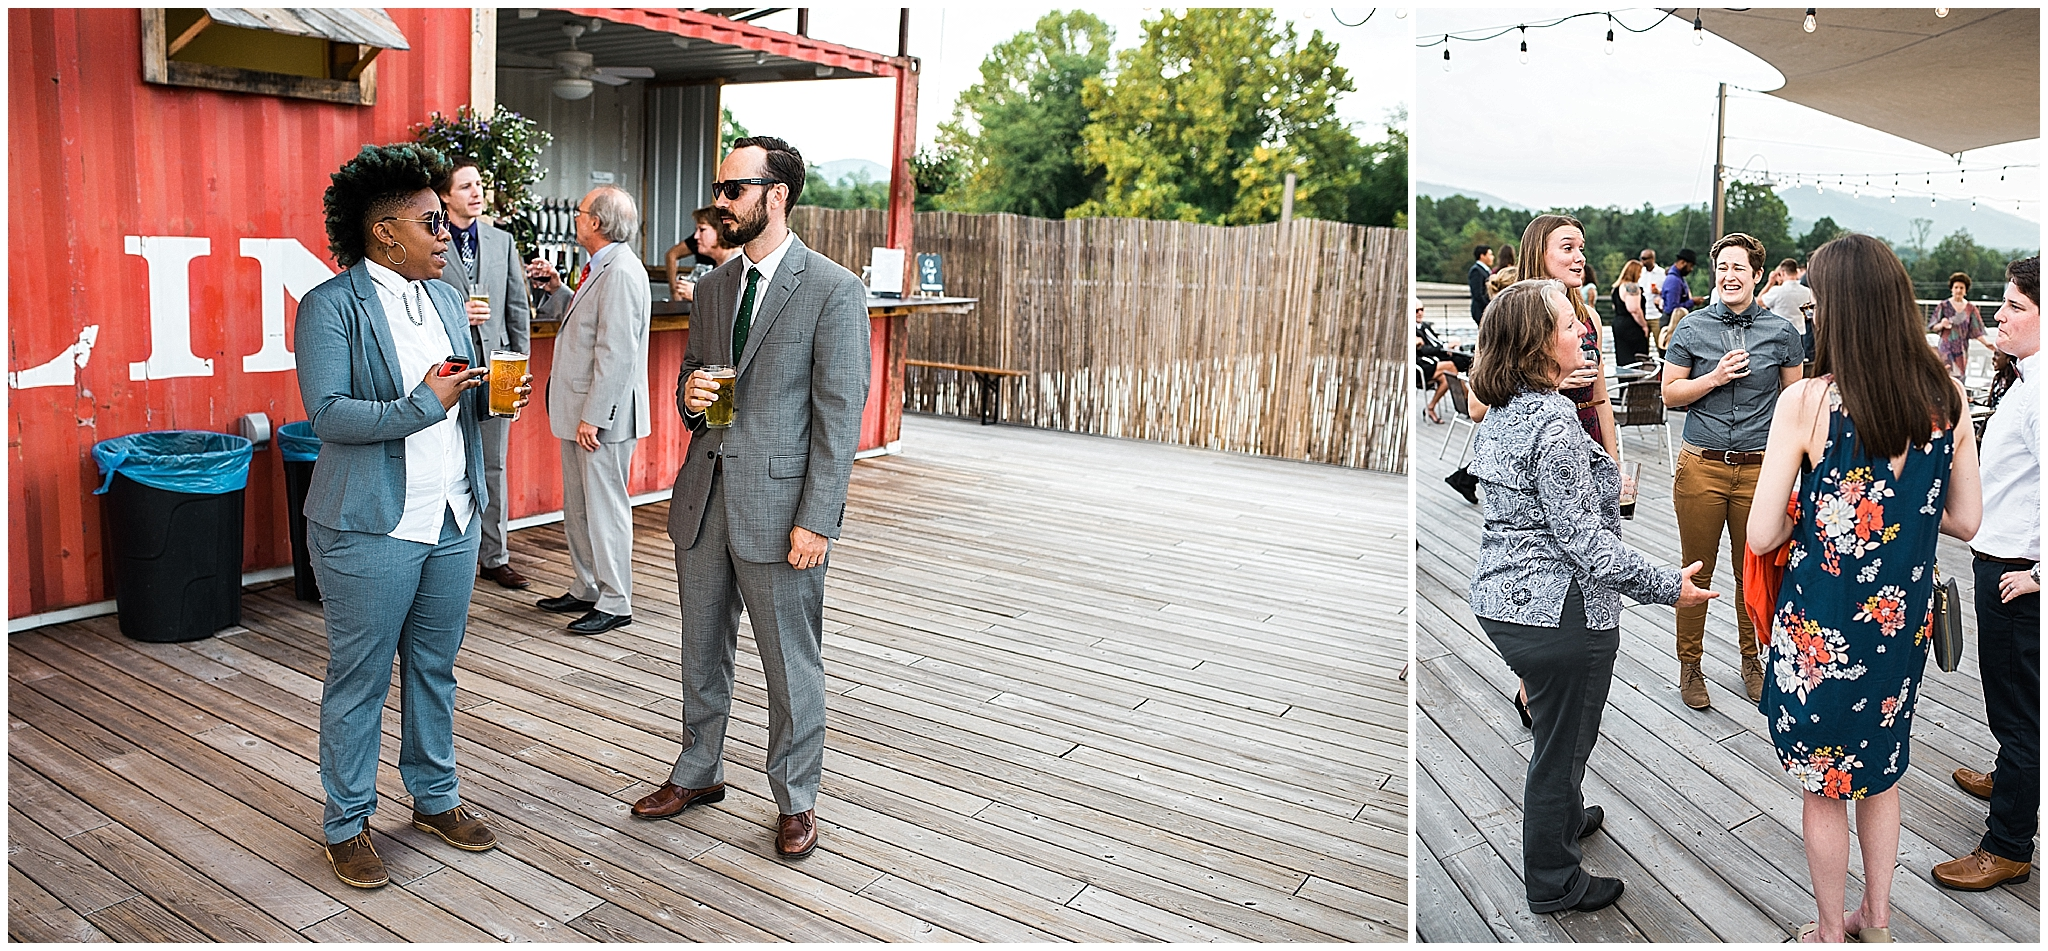 Wedding_Asheville_Highland_Brewing_Photographer_25.jpg